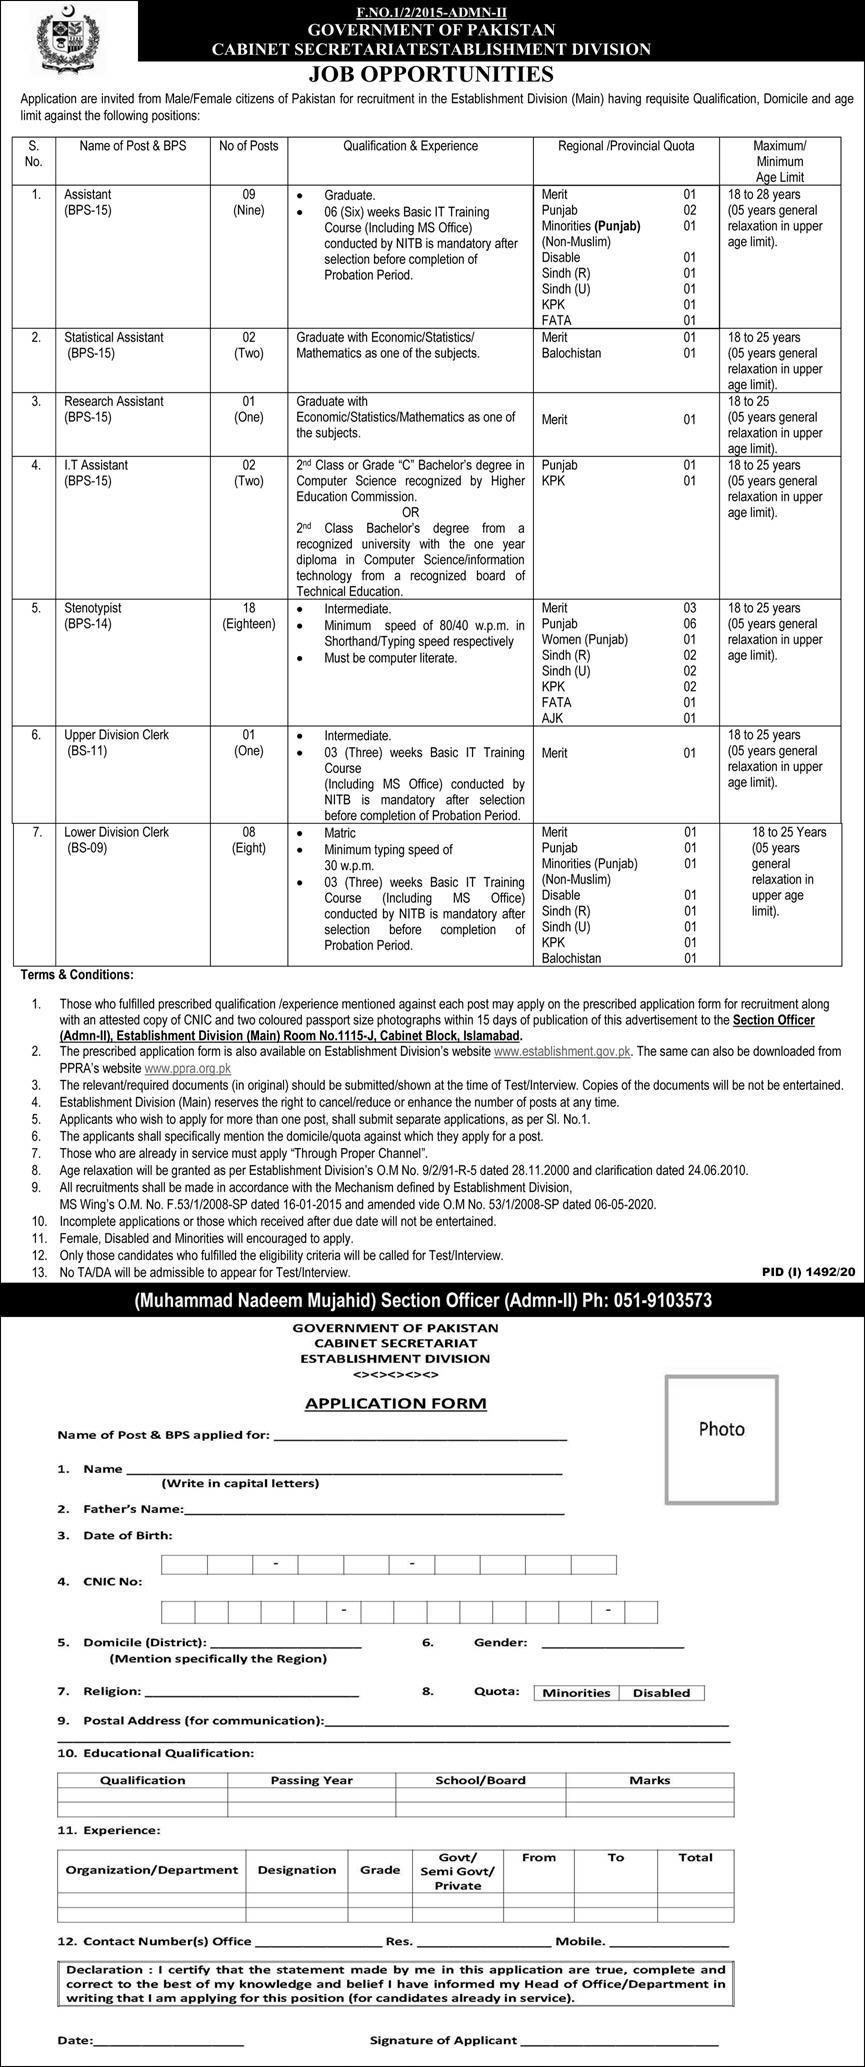 Cabinet Secretariat Establishment Division Islamabad Jobs September 2020 (41 Posts)